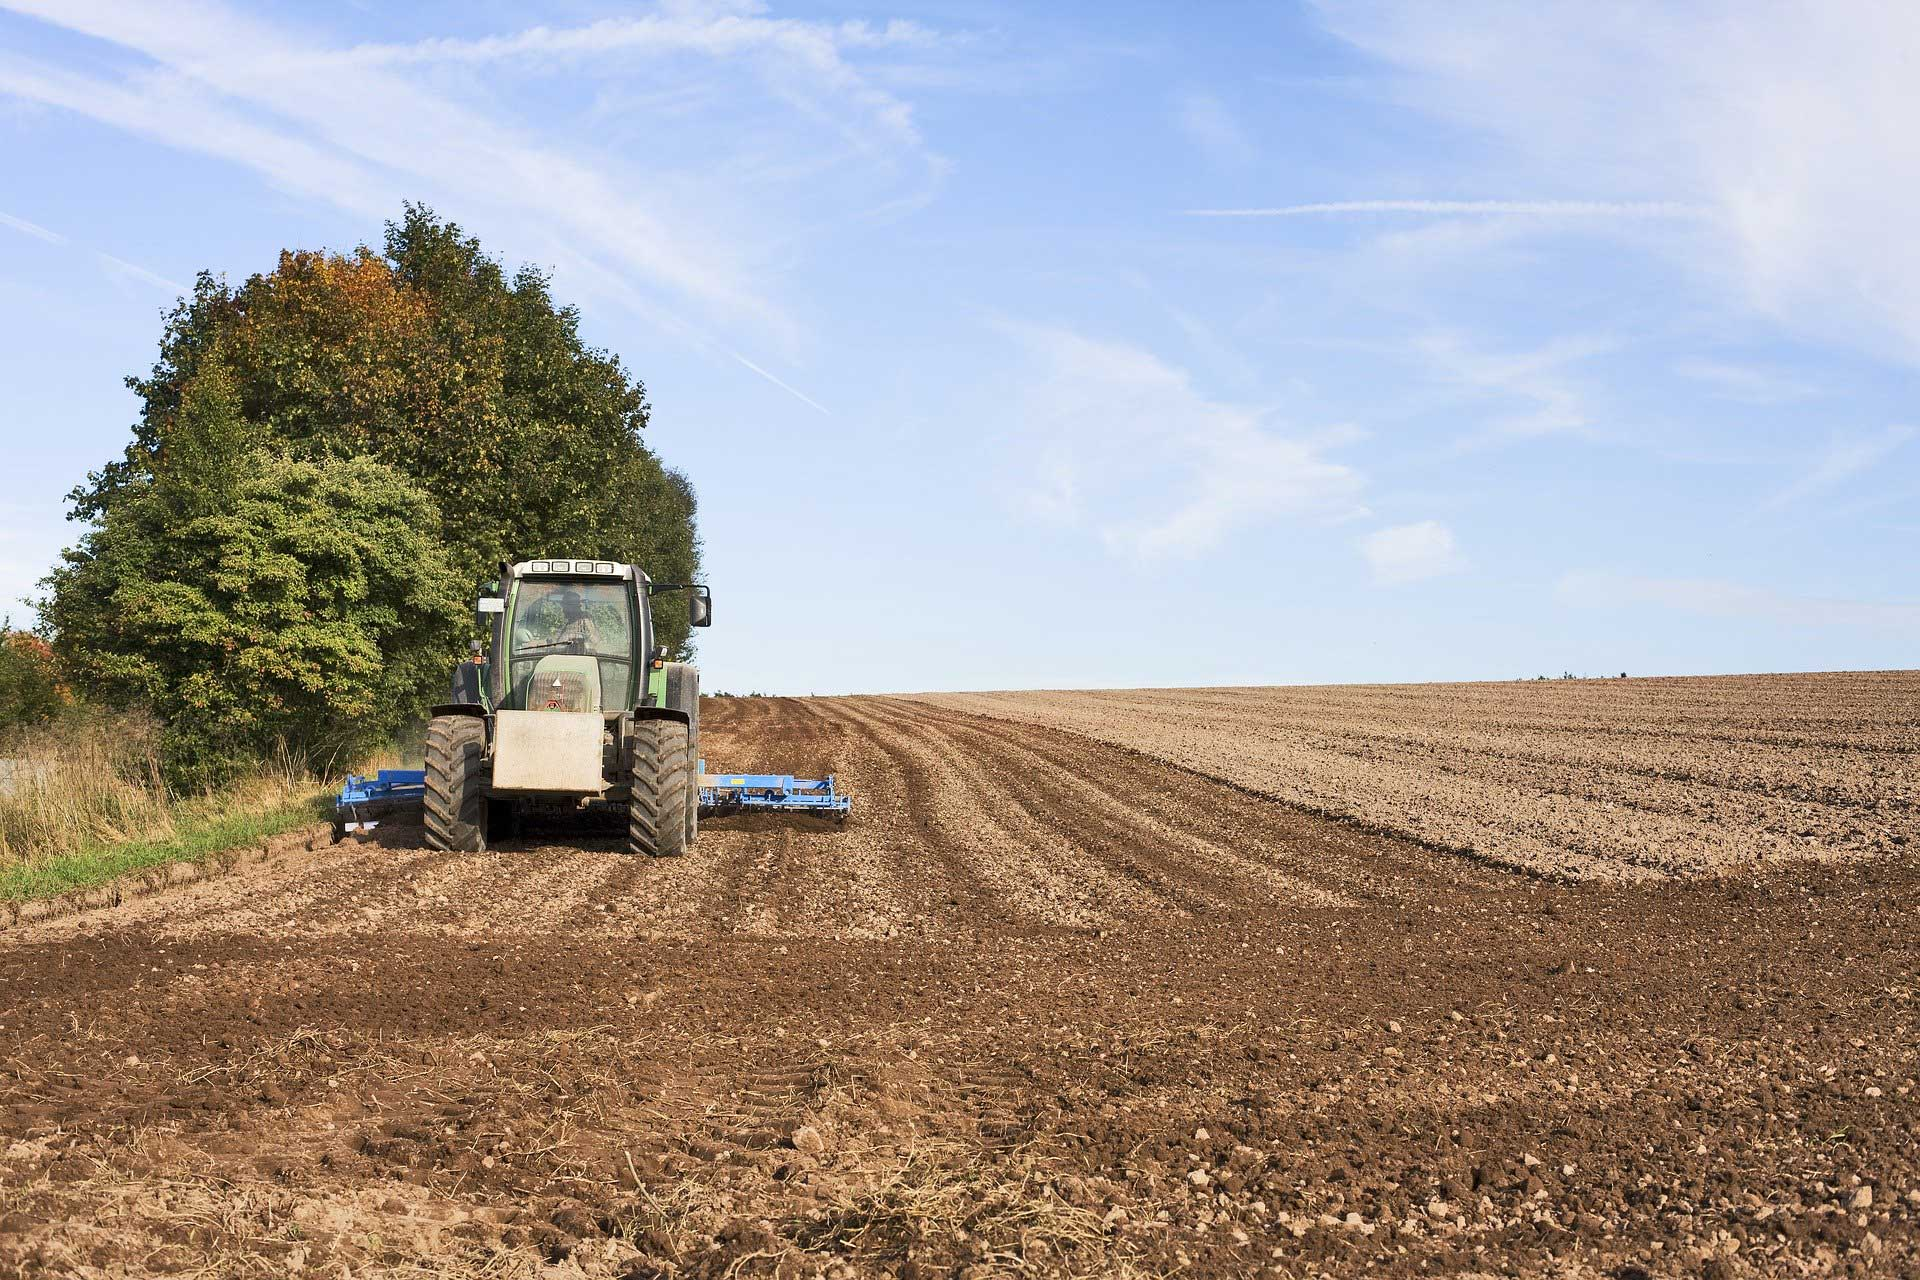 agricultura2W.jpg